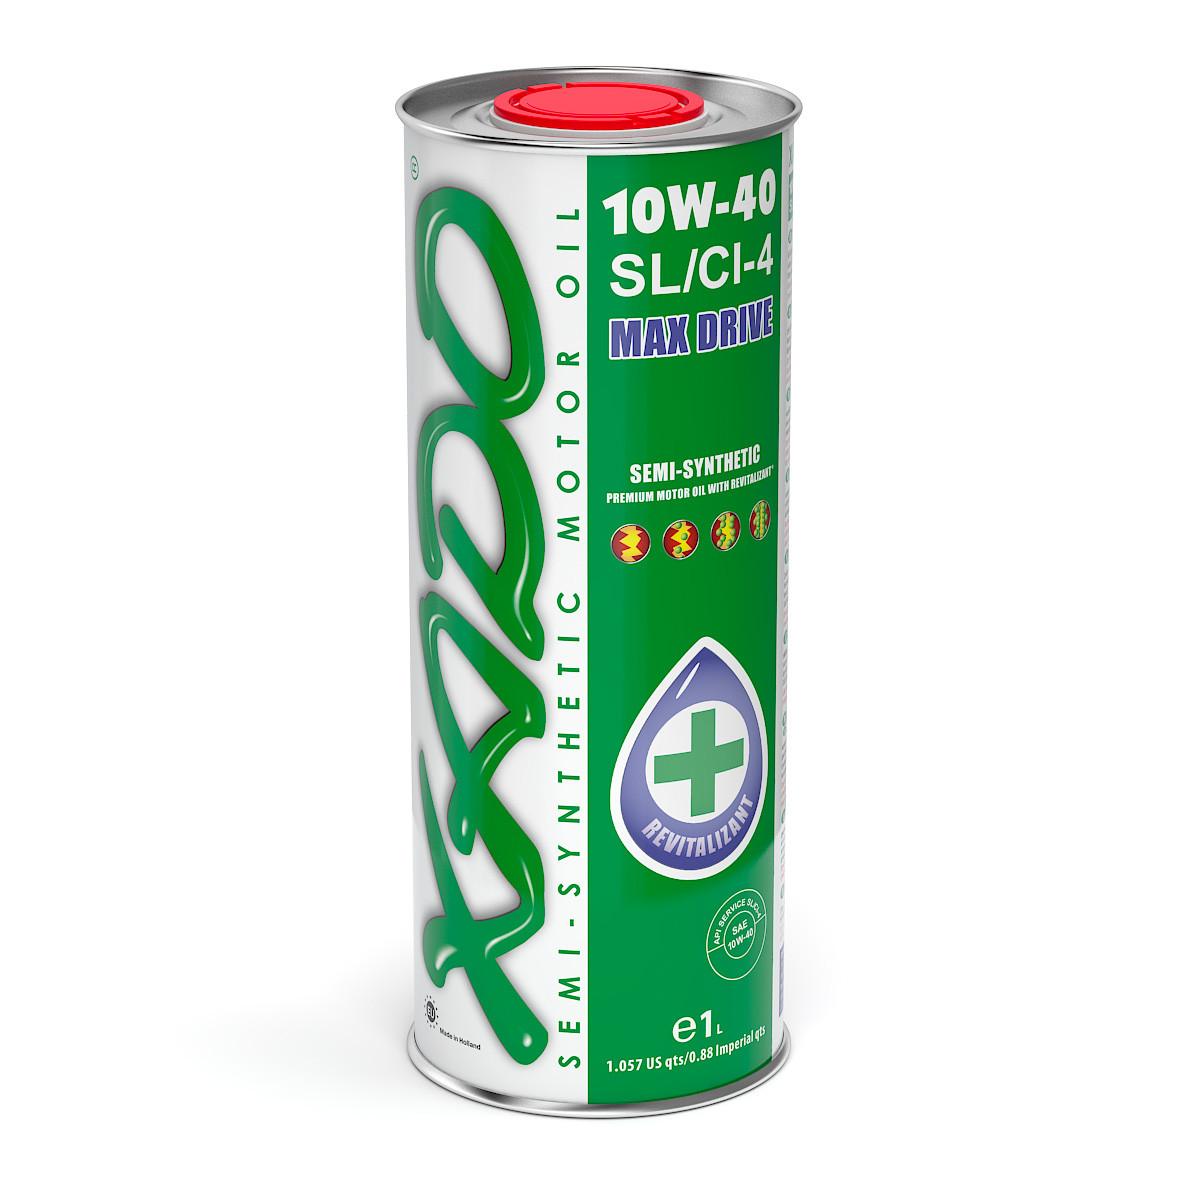 Полусинтетическое моторное масло ХАДО (XADO) Atomic oil 10w-40 1 л